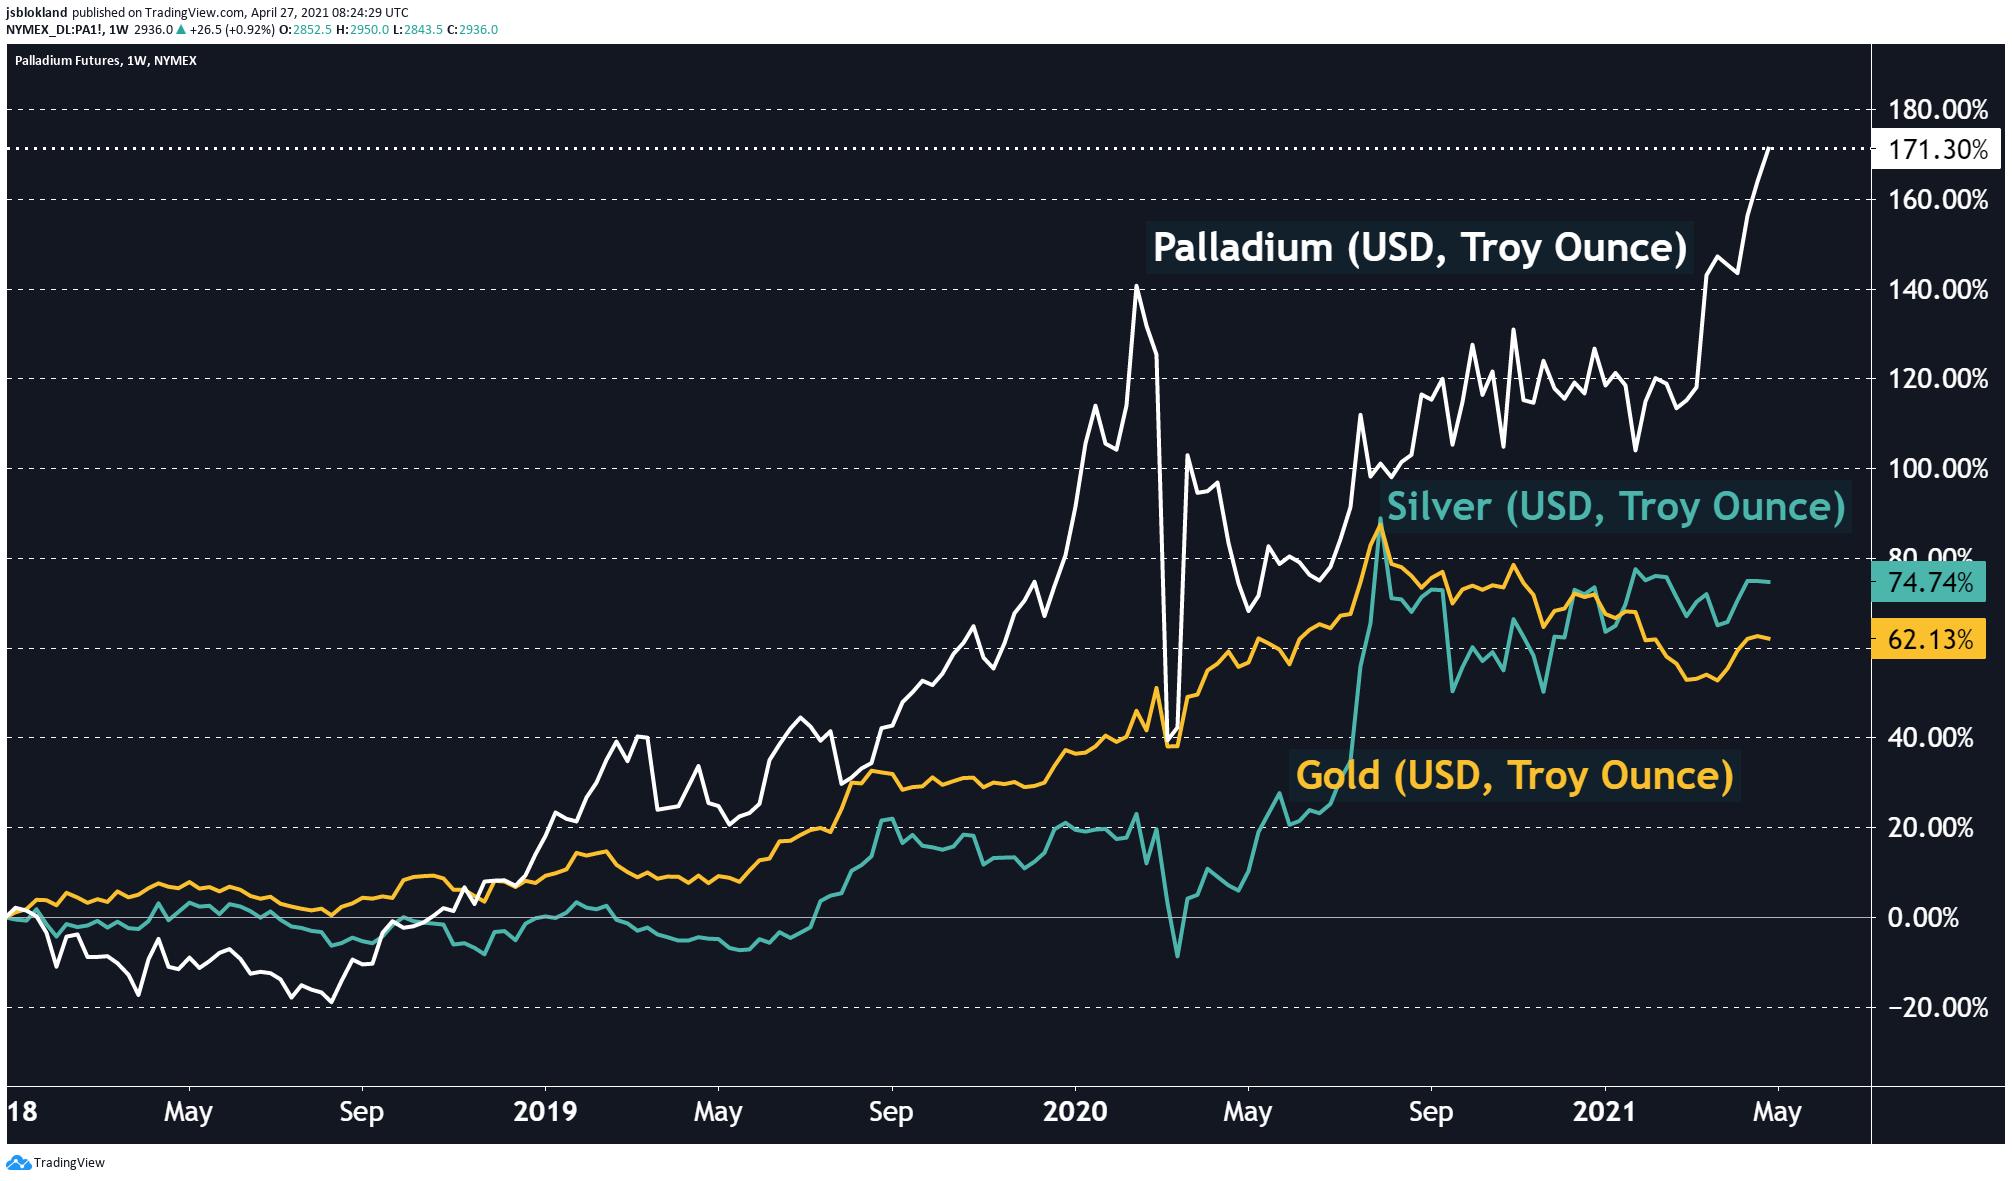 Is Palladium the king of metals?